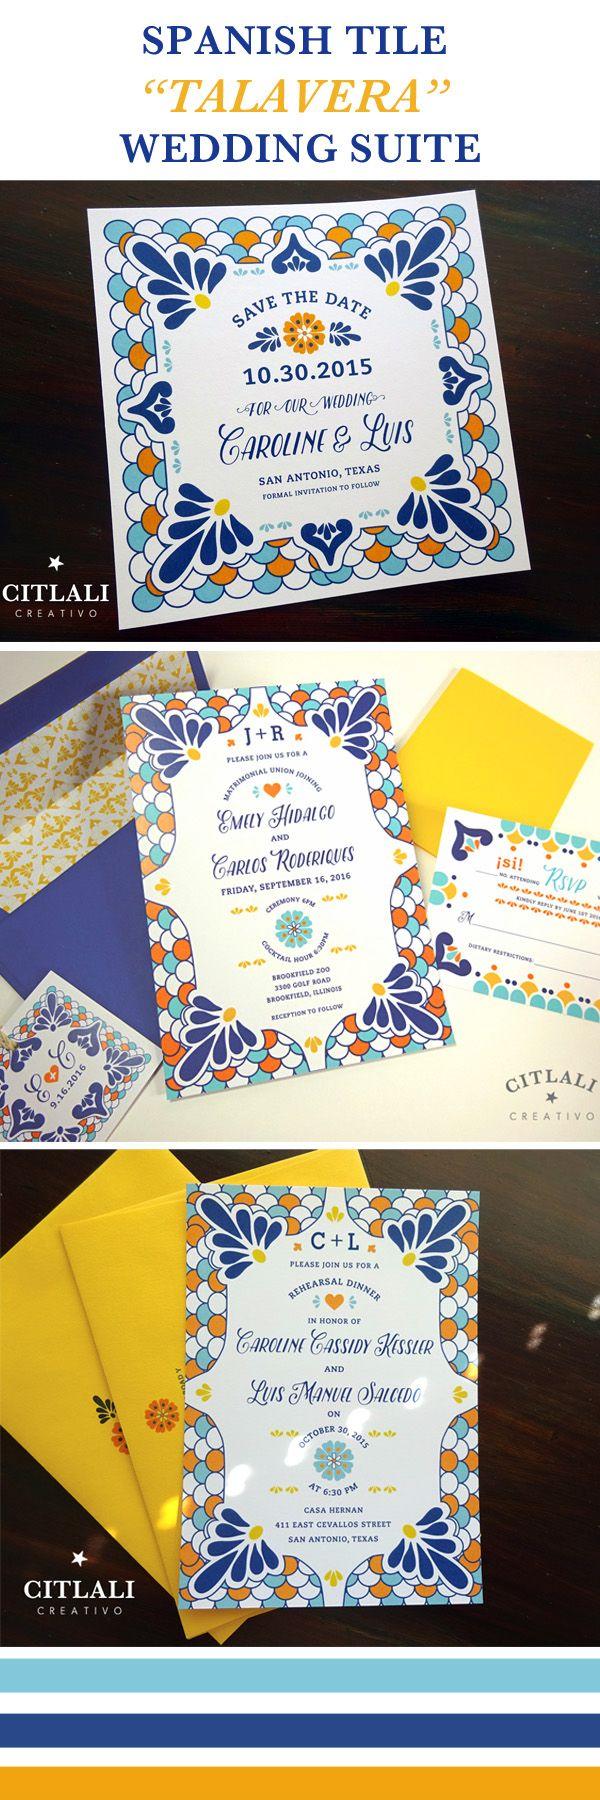 mexican wedding invitations mexican wedding invitations Talavera Wedding Suite Spanish Tile Invitations Save the dates citlalicreativo com